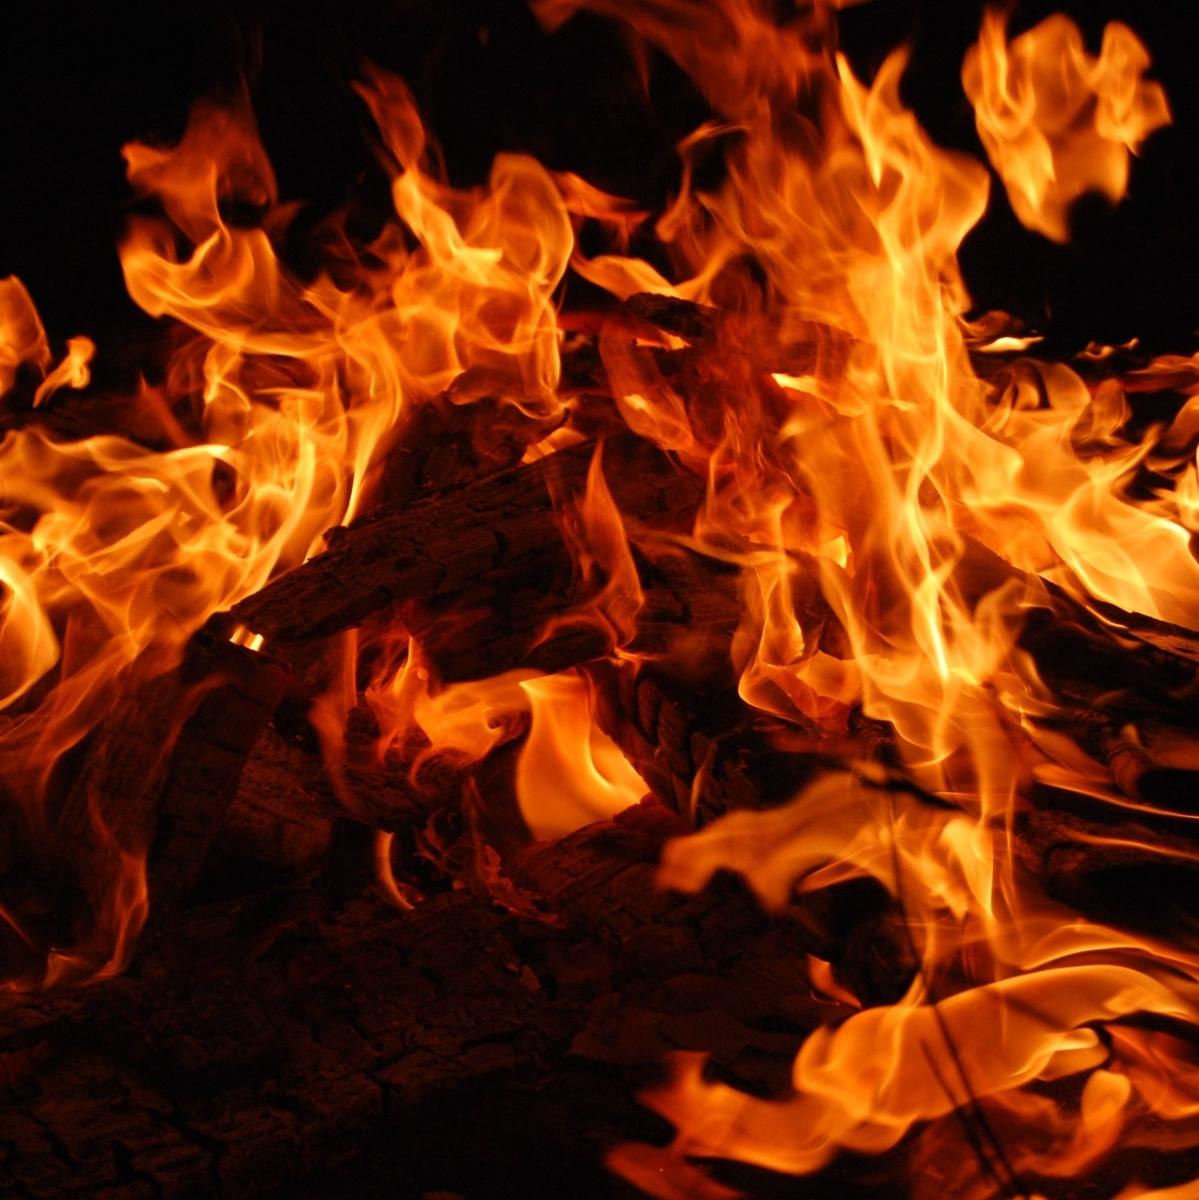 Mumbai: Bollywood filmmaker Santosh Gupta's wife and daughter set themselves on fire